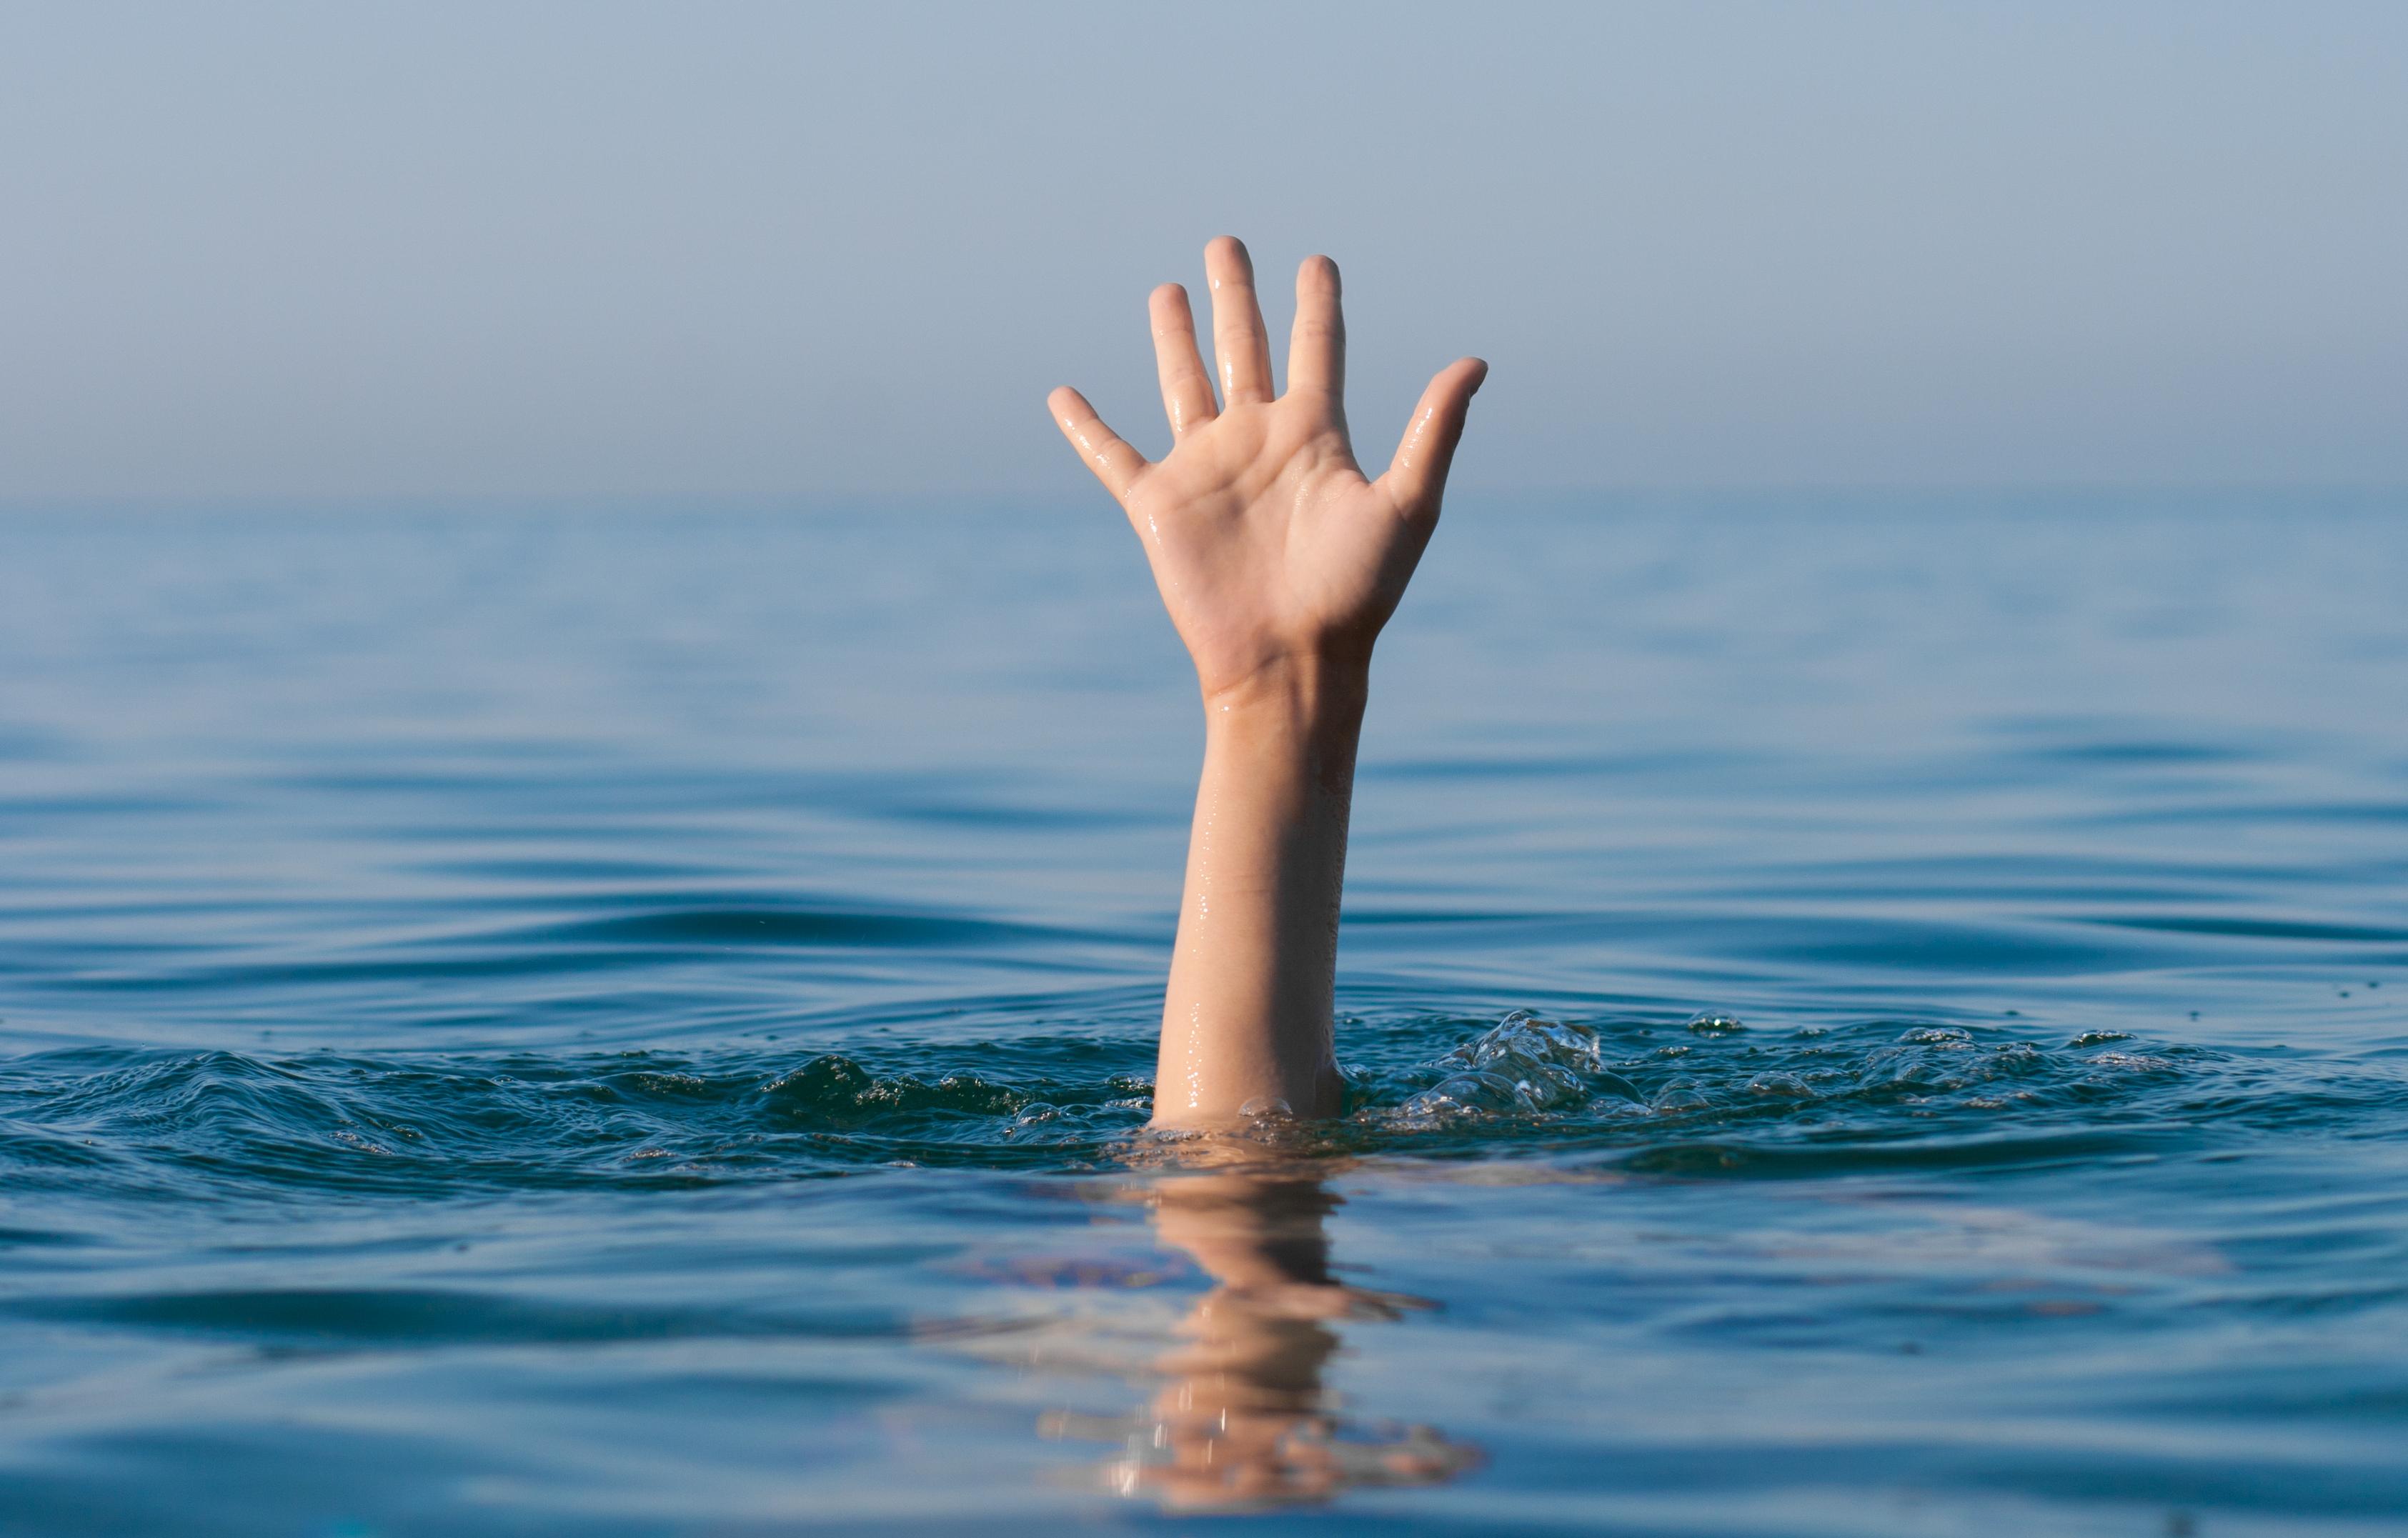 https://depositphotos.com/5312864/stock-photo-single-hand-of-drowning-man.html